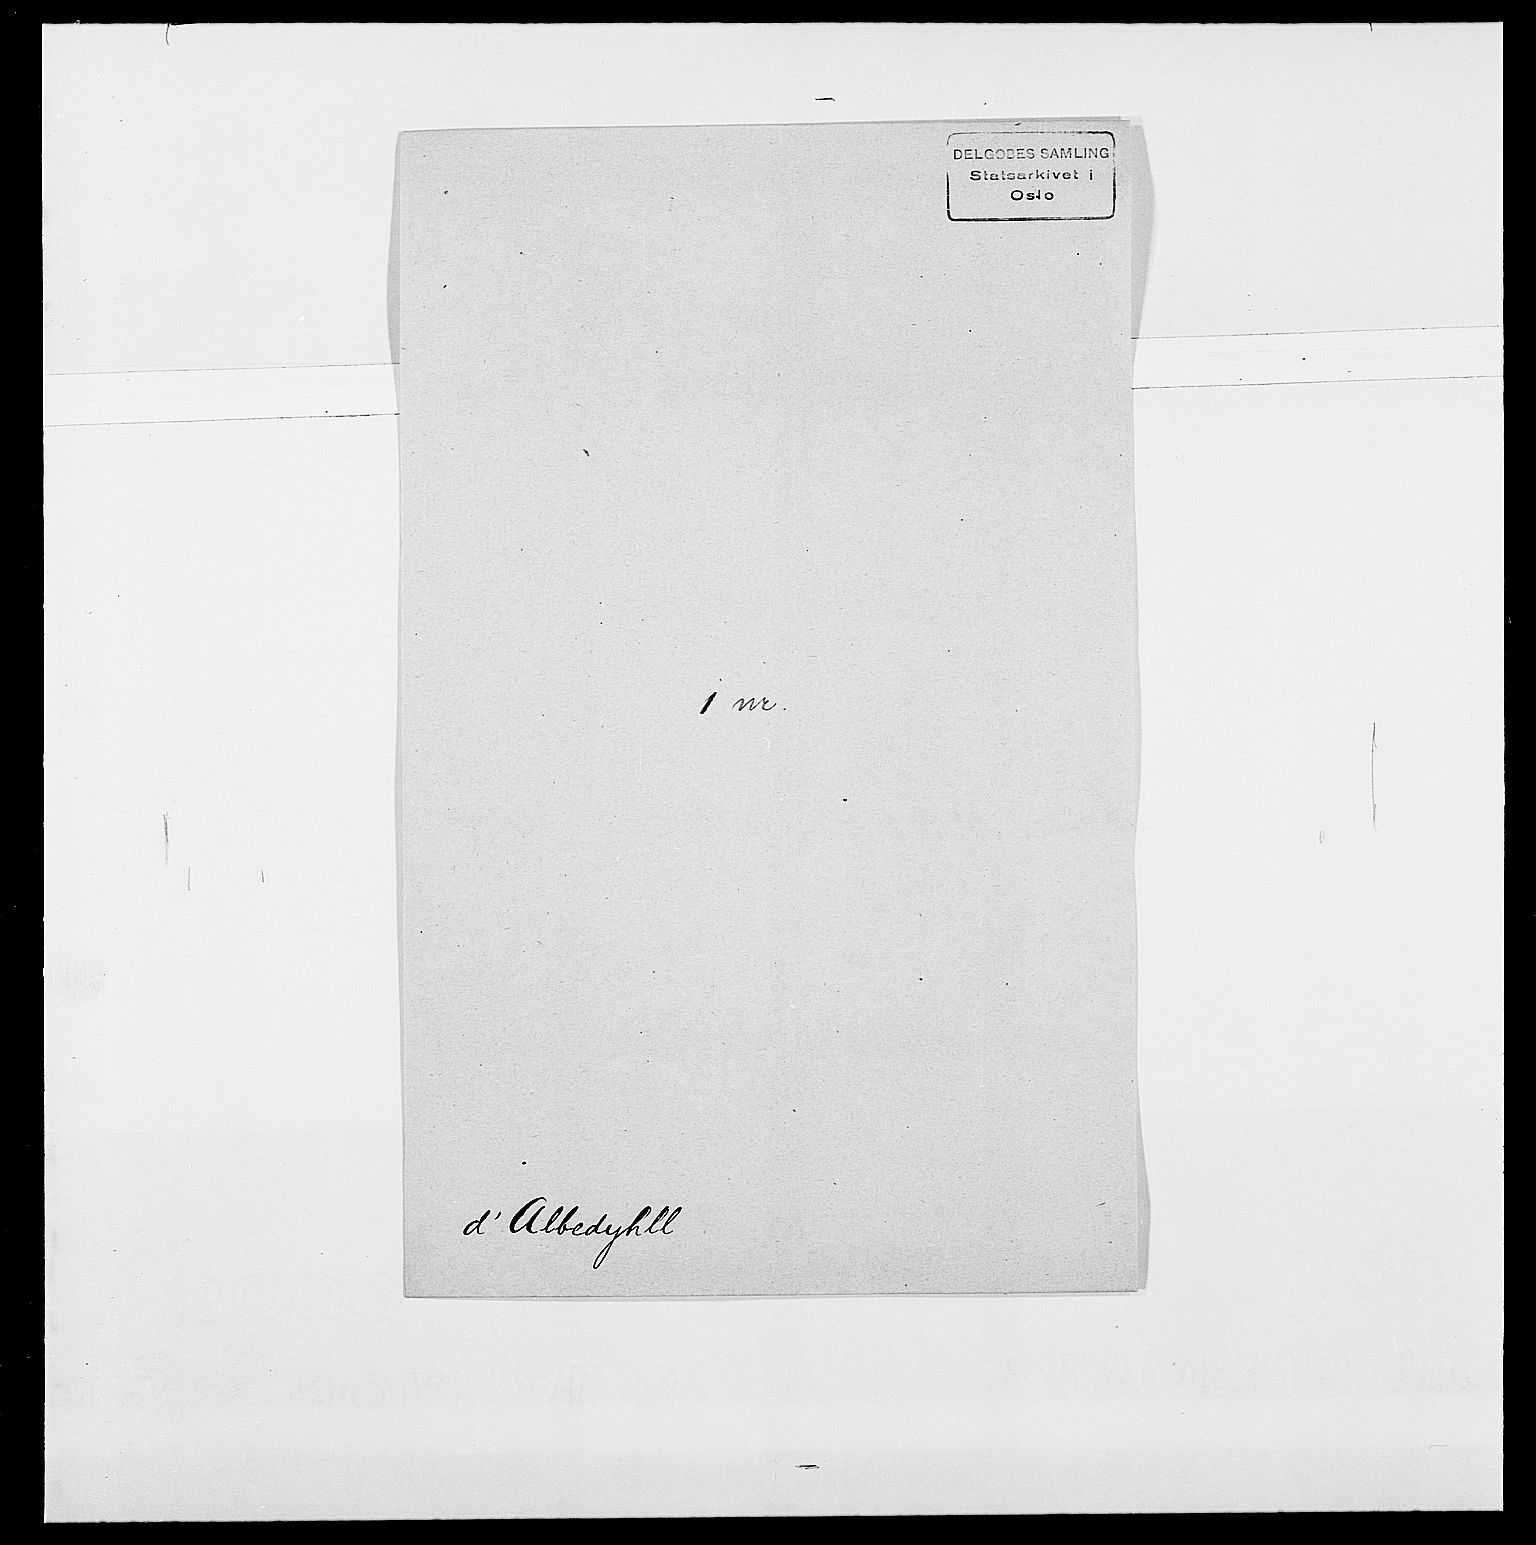 SAO, Delgobe, Charles Antoine - samling, D/Da/L0001: Aabye - Angerman, s. 362